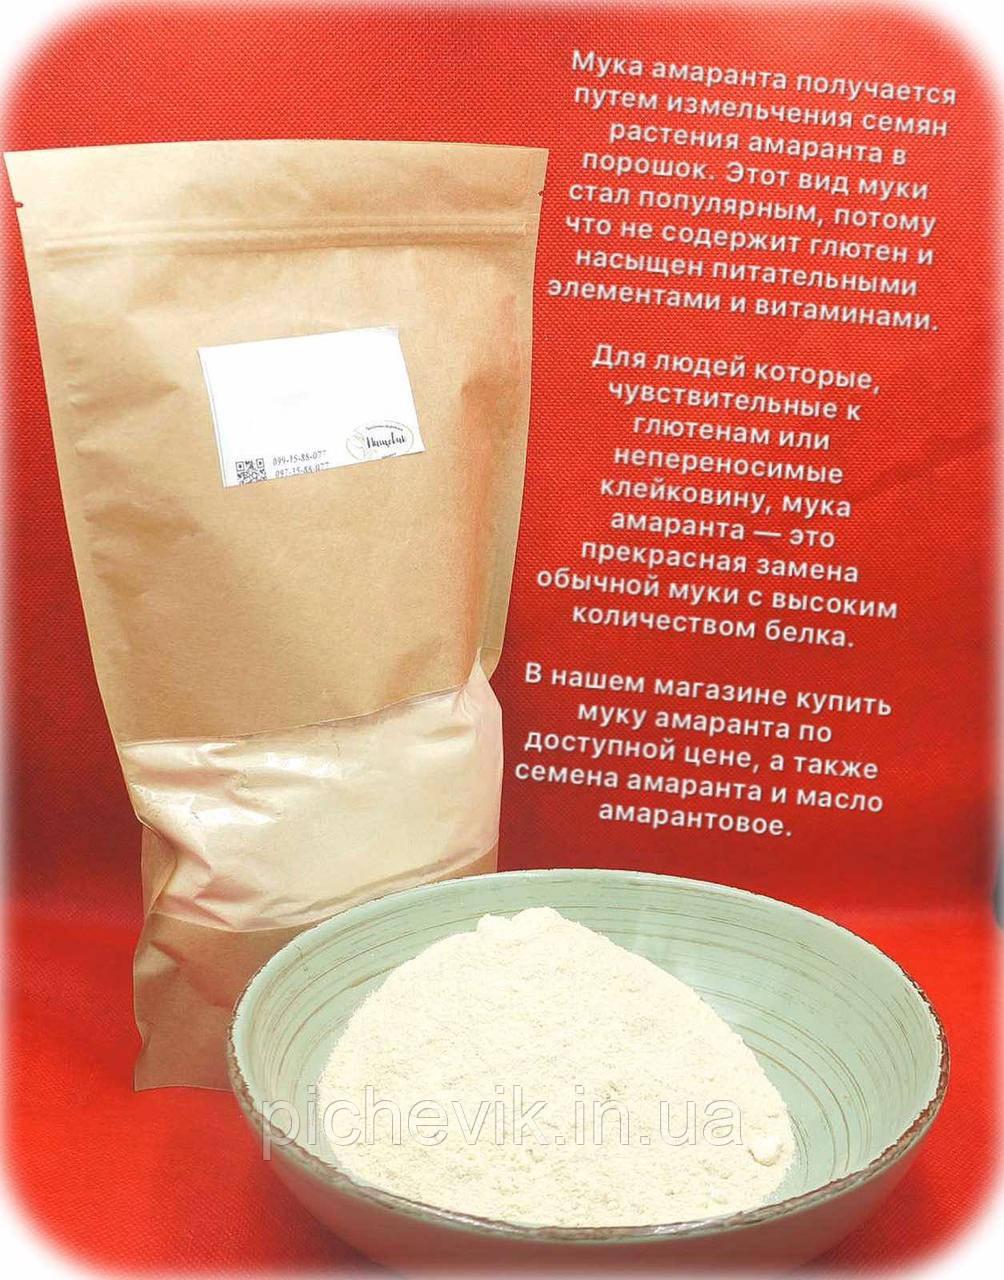 Мука амарантовая (Украина) Вес: 500 гр